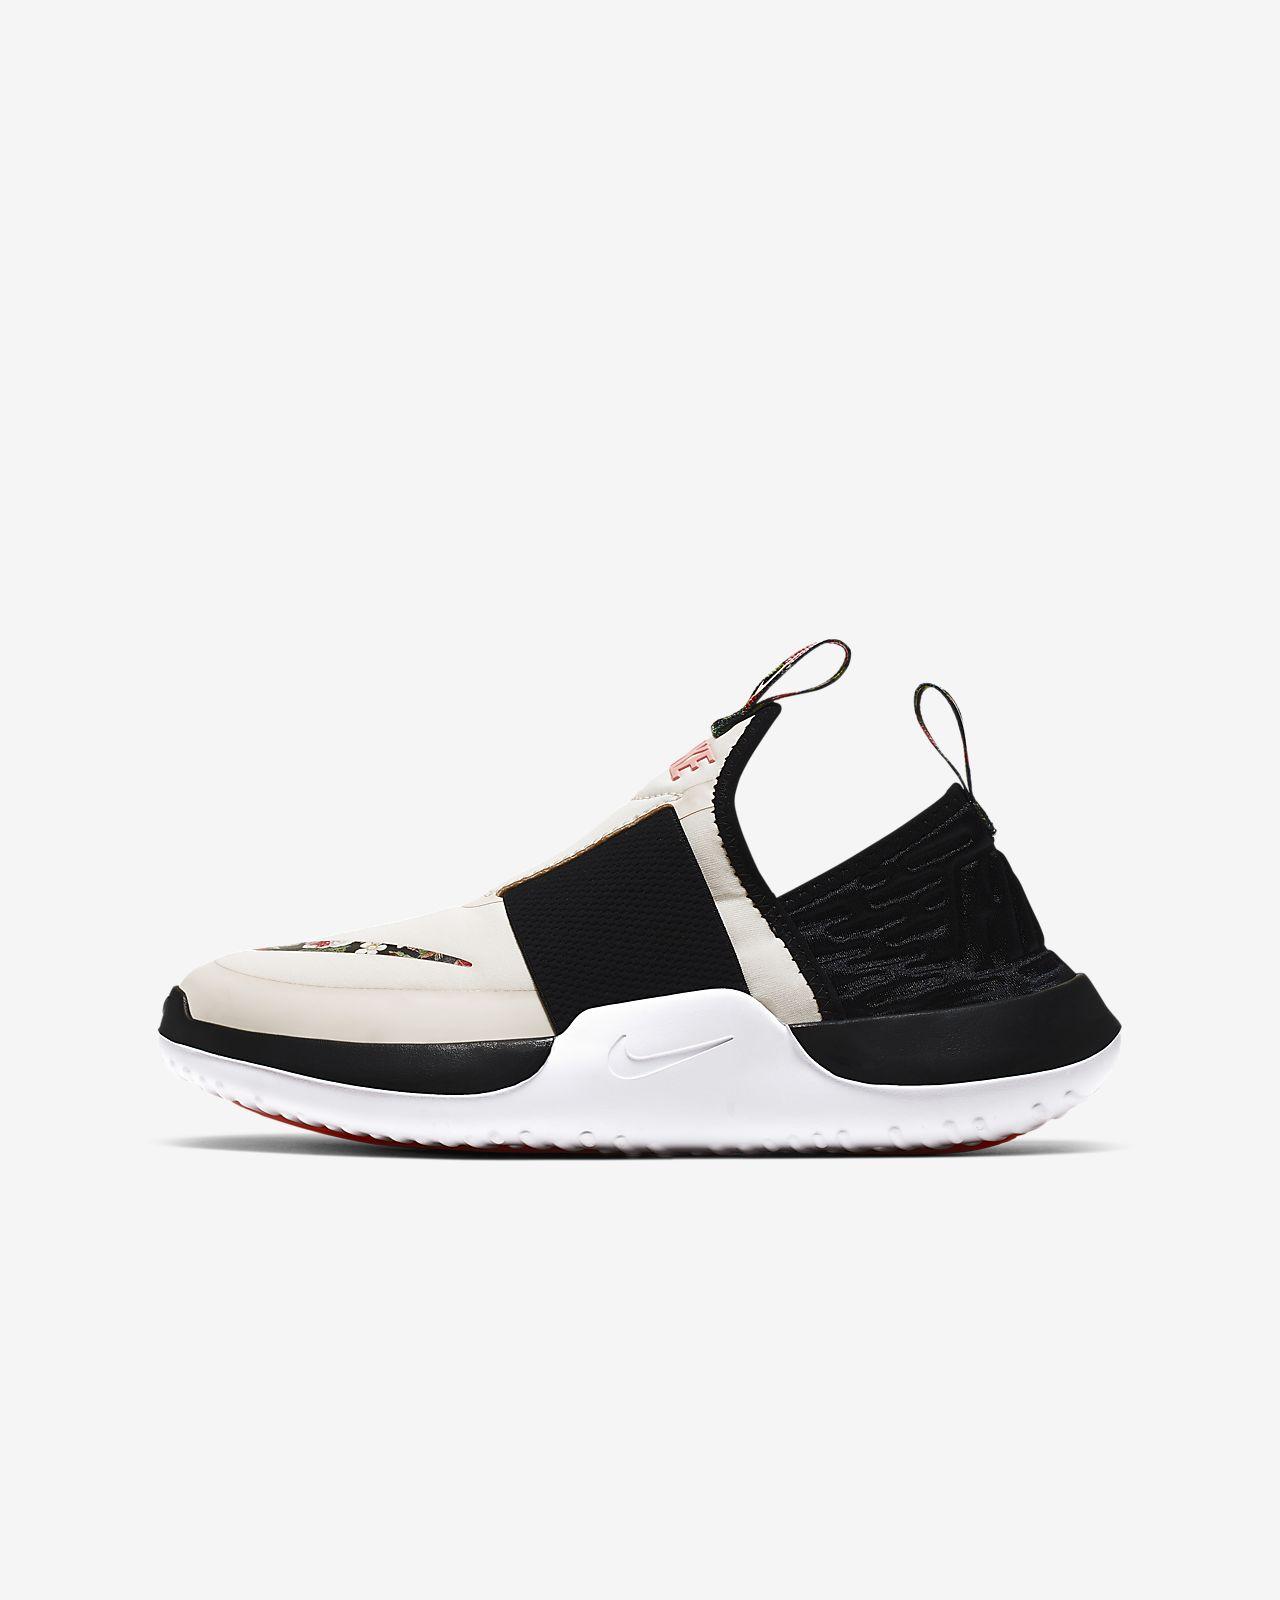 Nike NitrofloVF (GS)大童运动童鞋